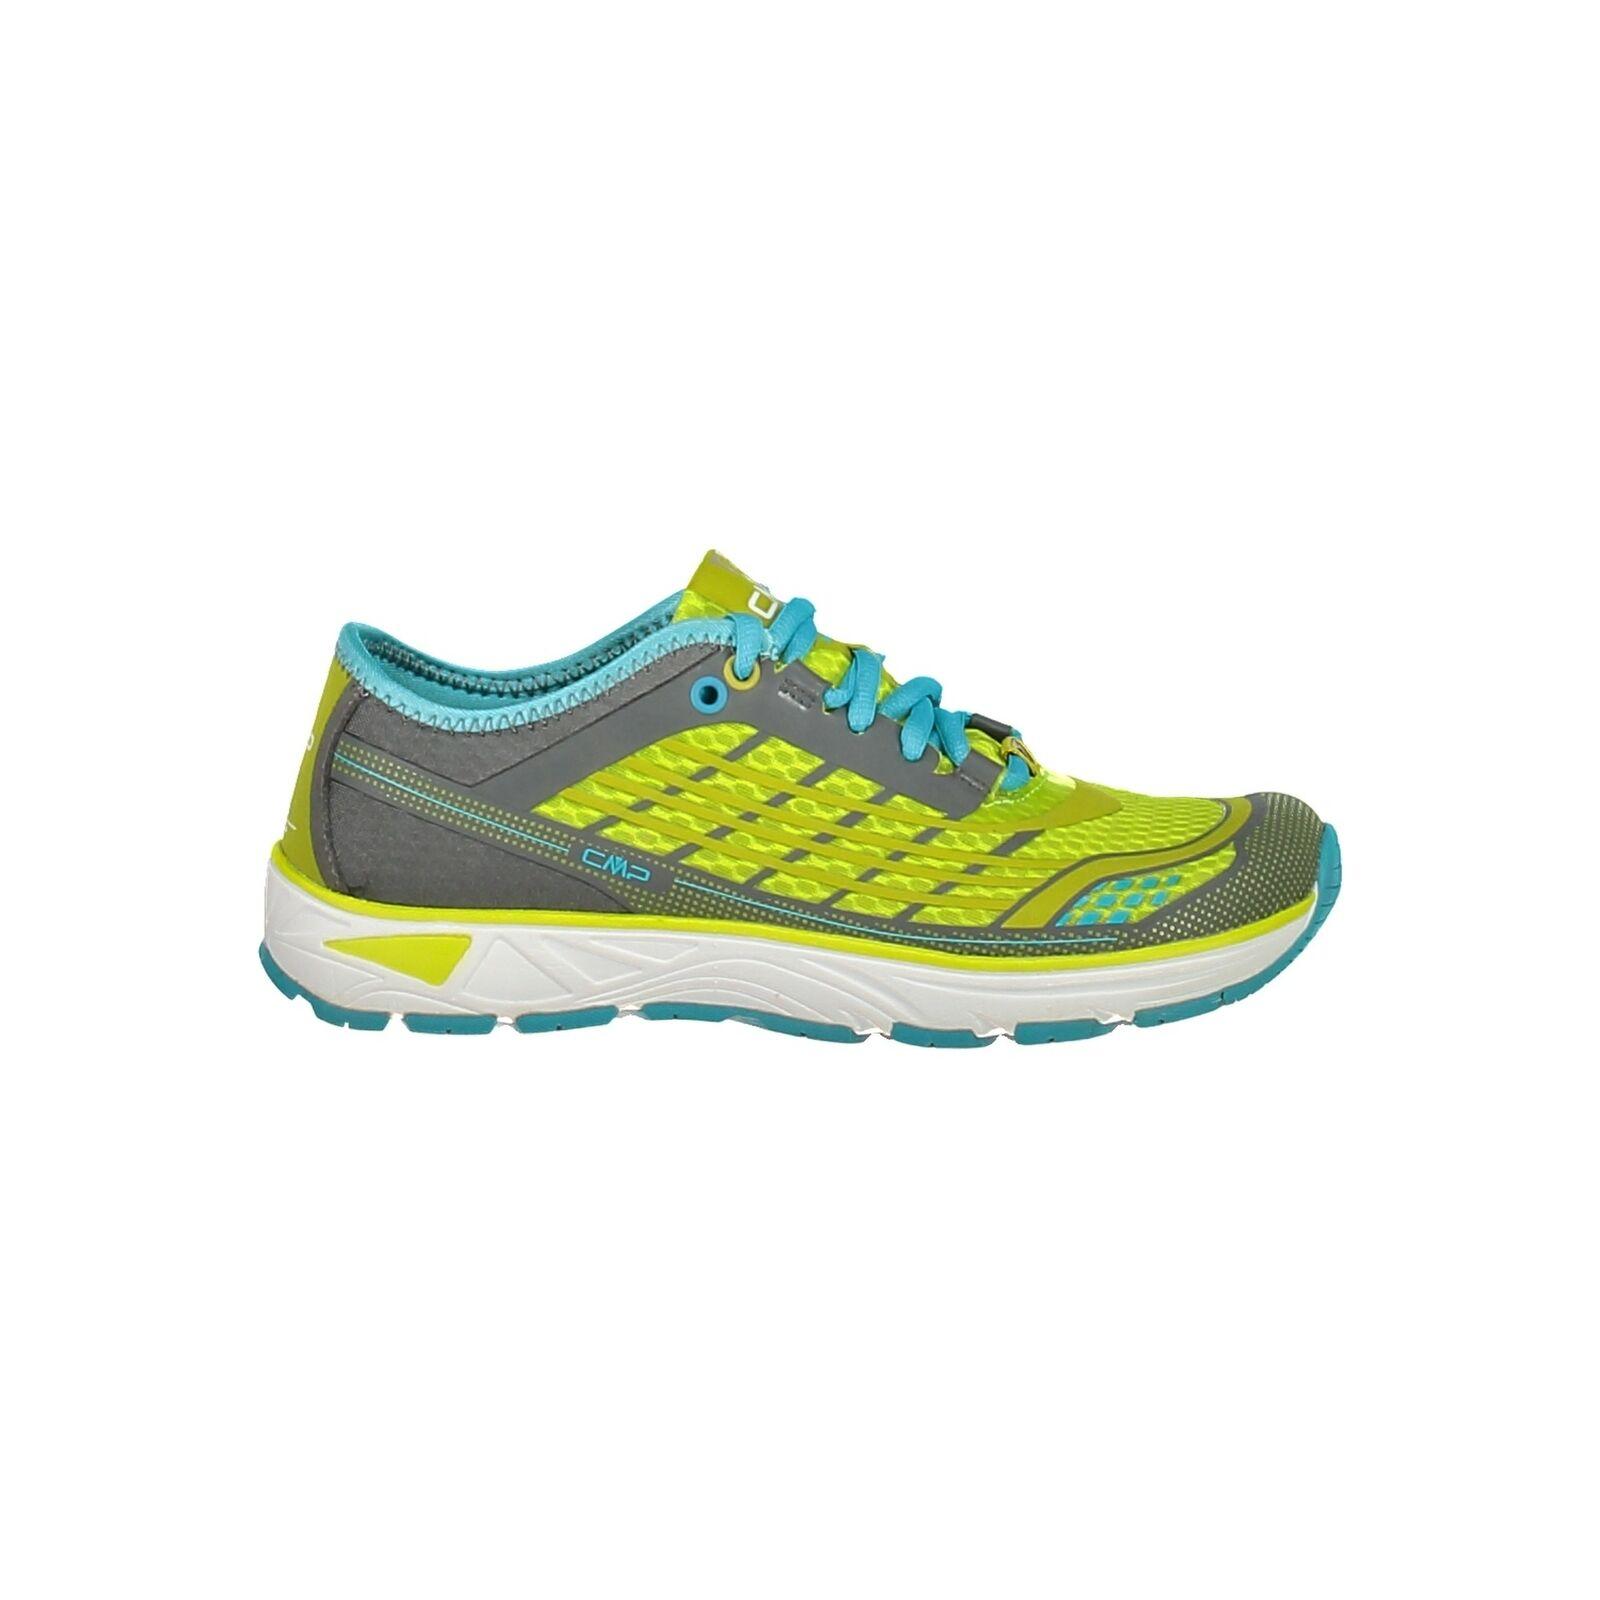 CMP Zapatillas Deportivas Correr Libre Wmn Running Zapatos gris Liviando Colors